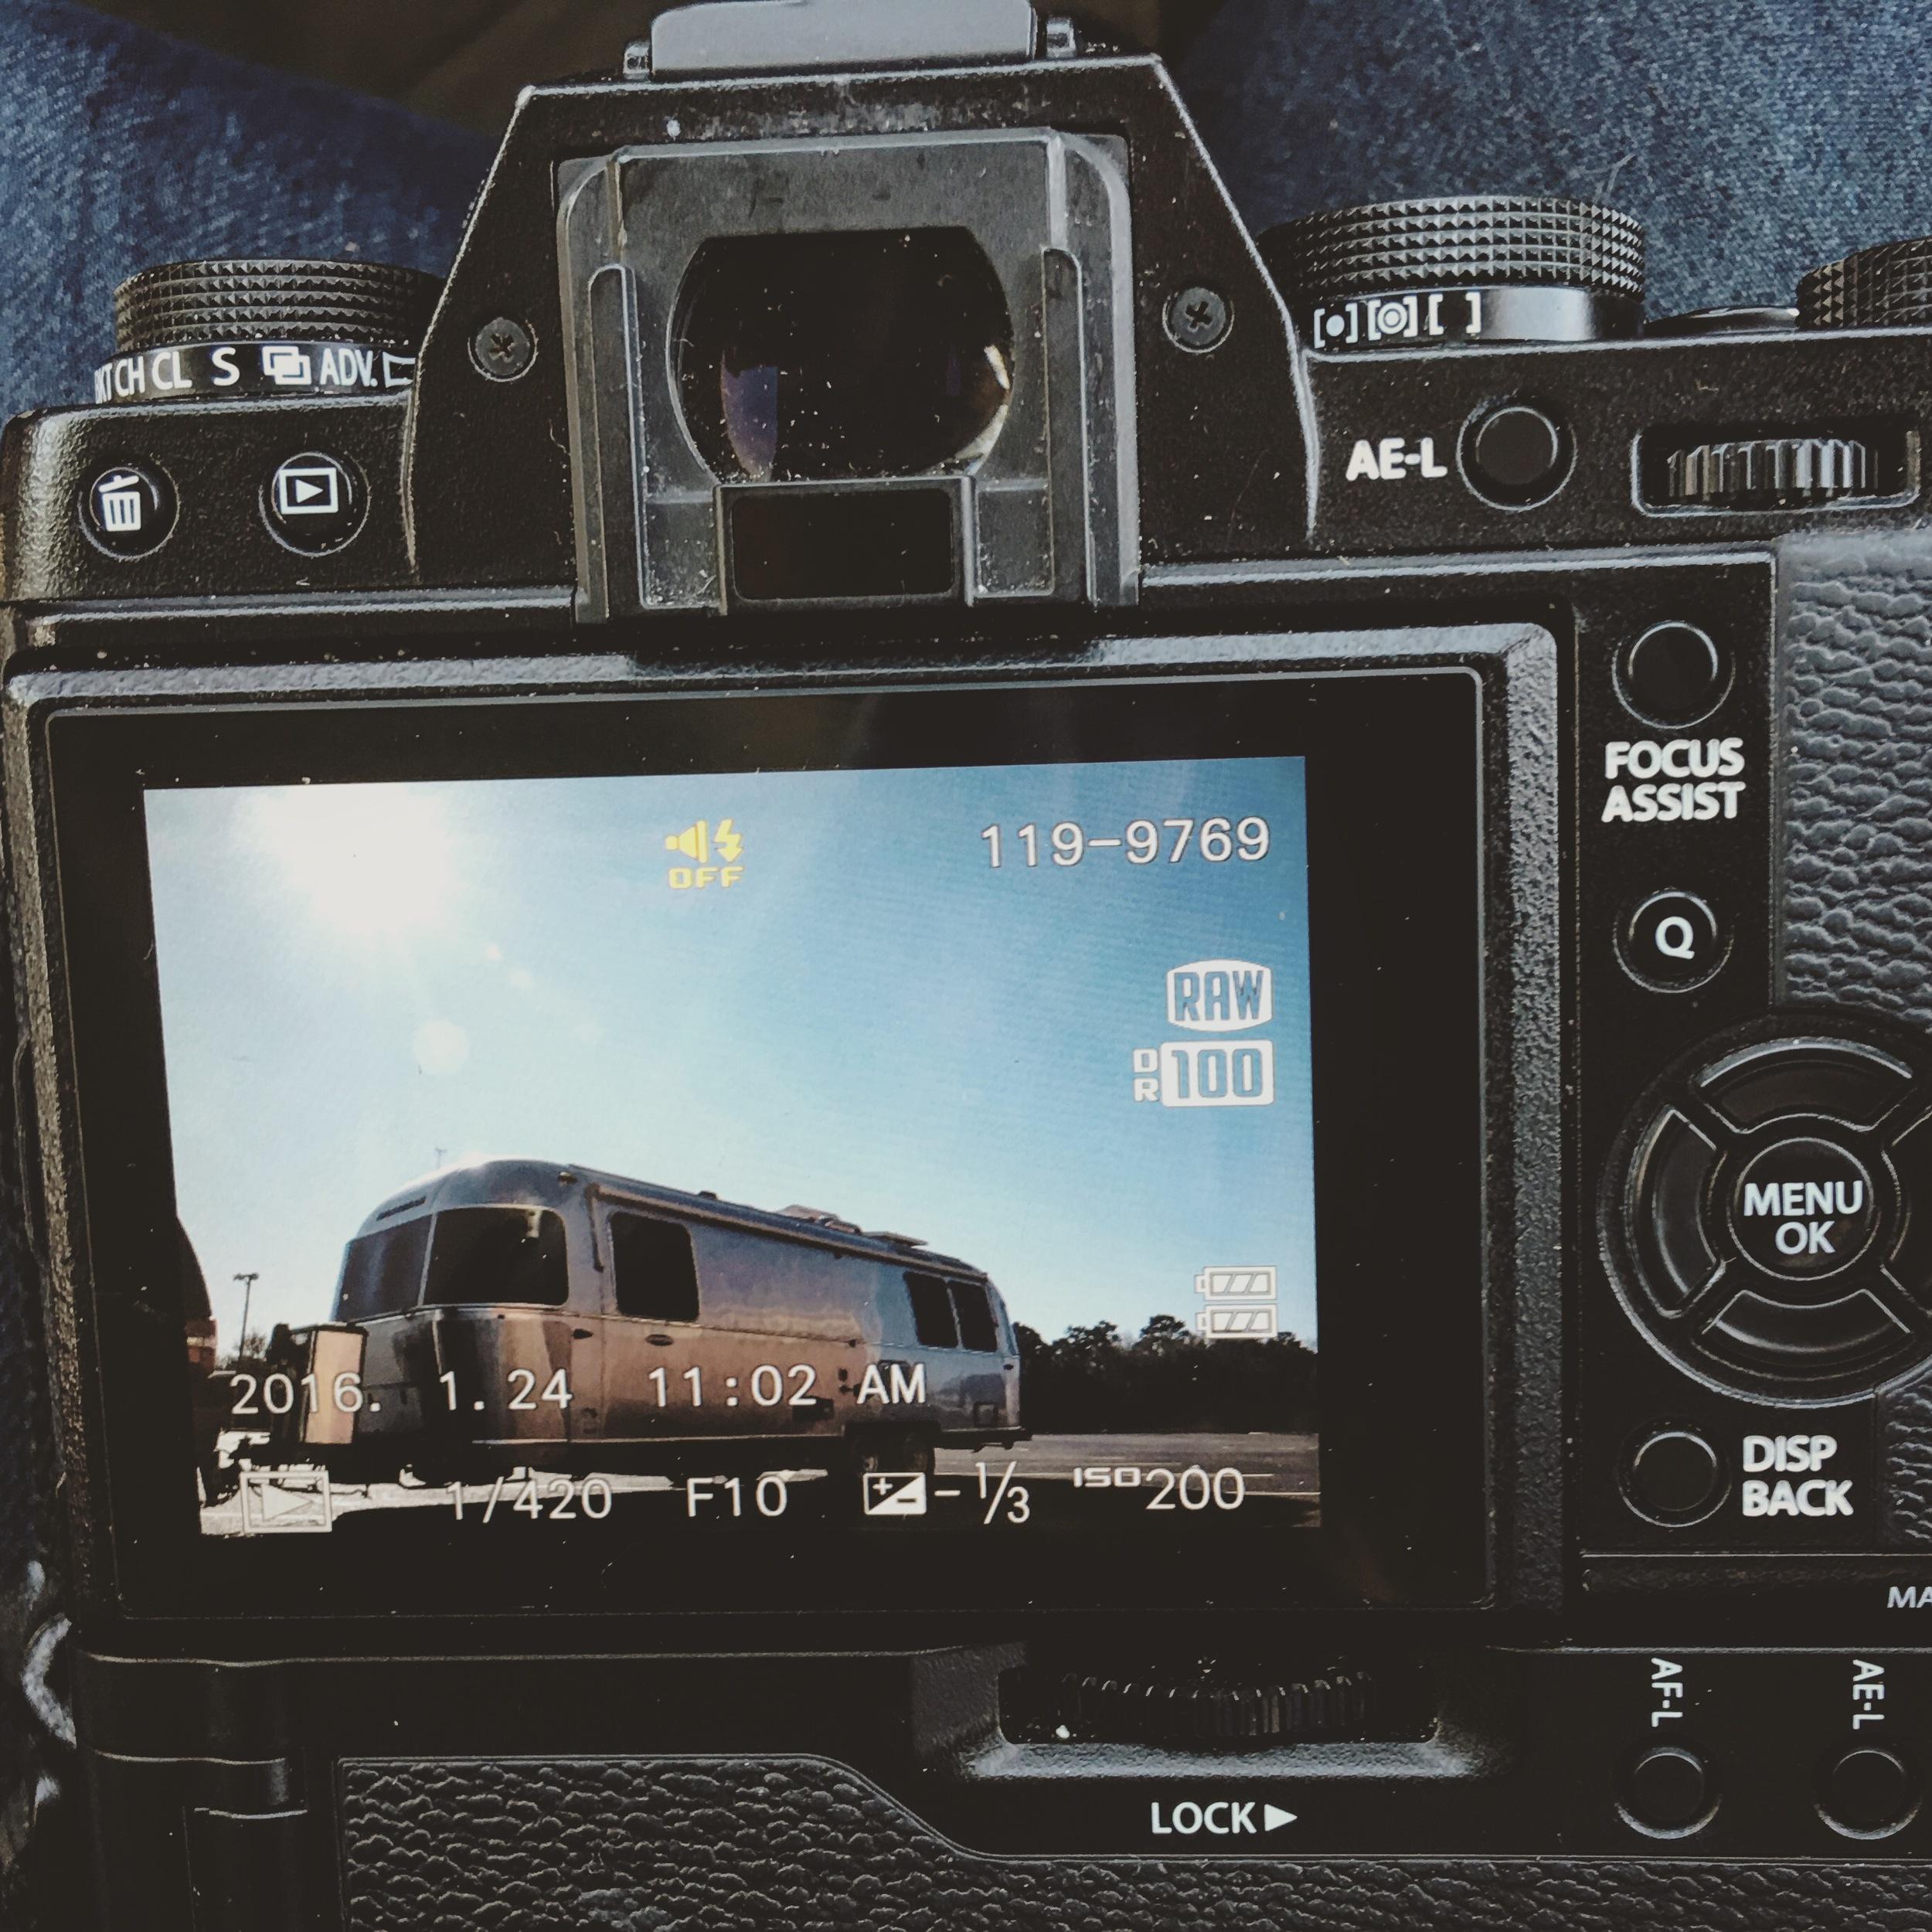 Airstream on display screen of Fujifilm X Series